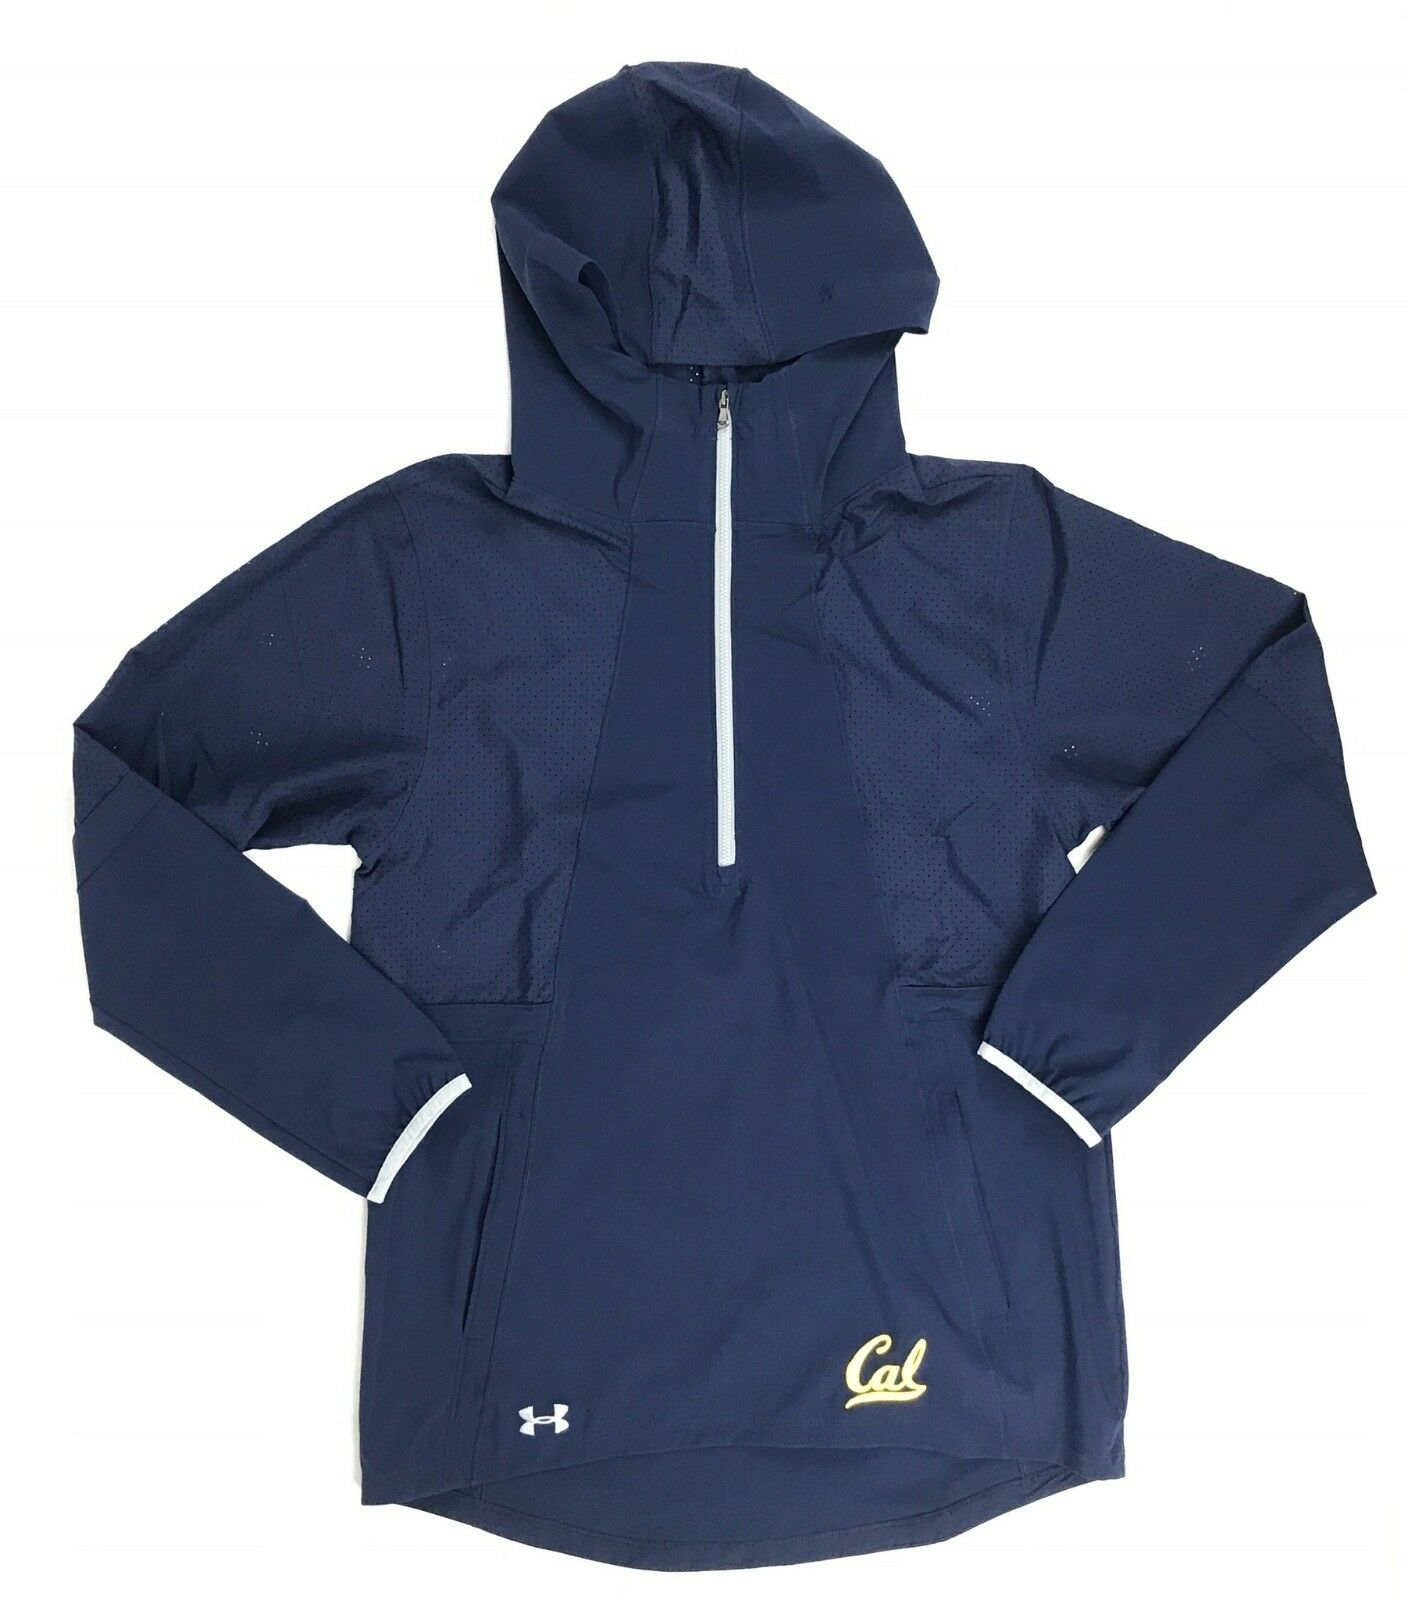 02e0252d65 Under Armour California Cal Bears Warm Up 1/2 Zip Jacket Pullover ...